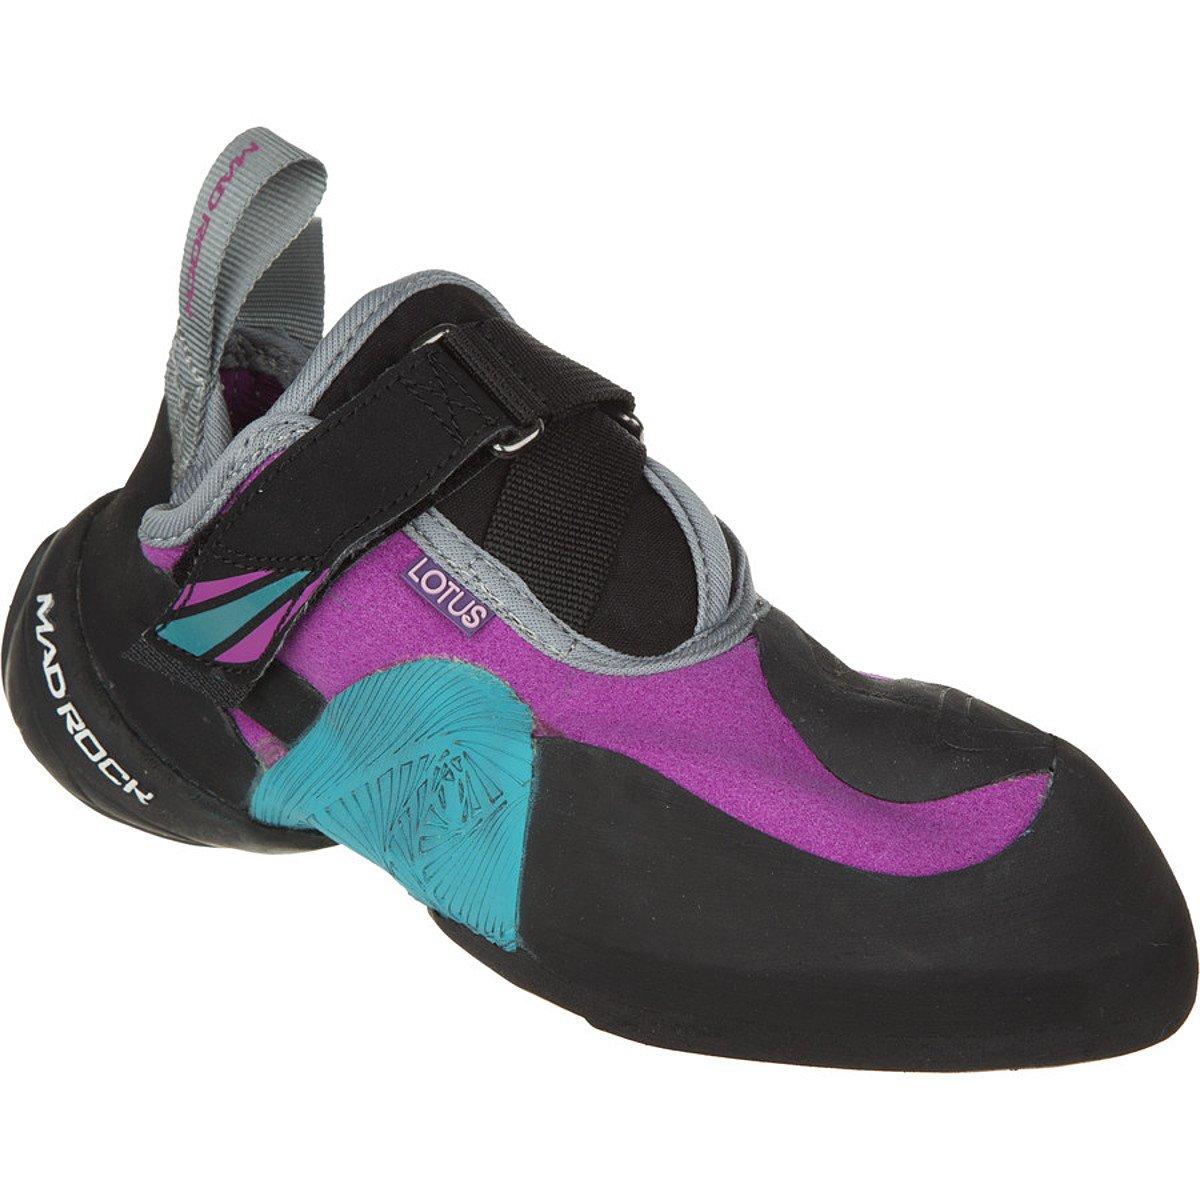 Mad Rock Lotus Climbing Shoes - Women's 6.5